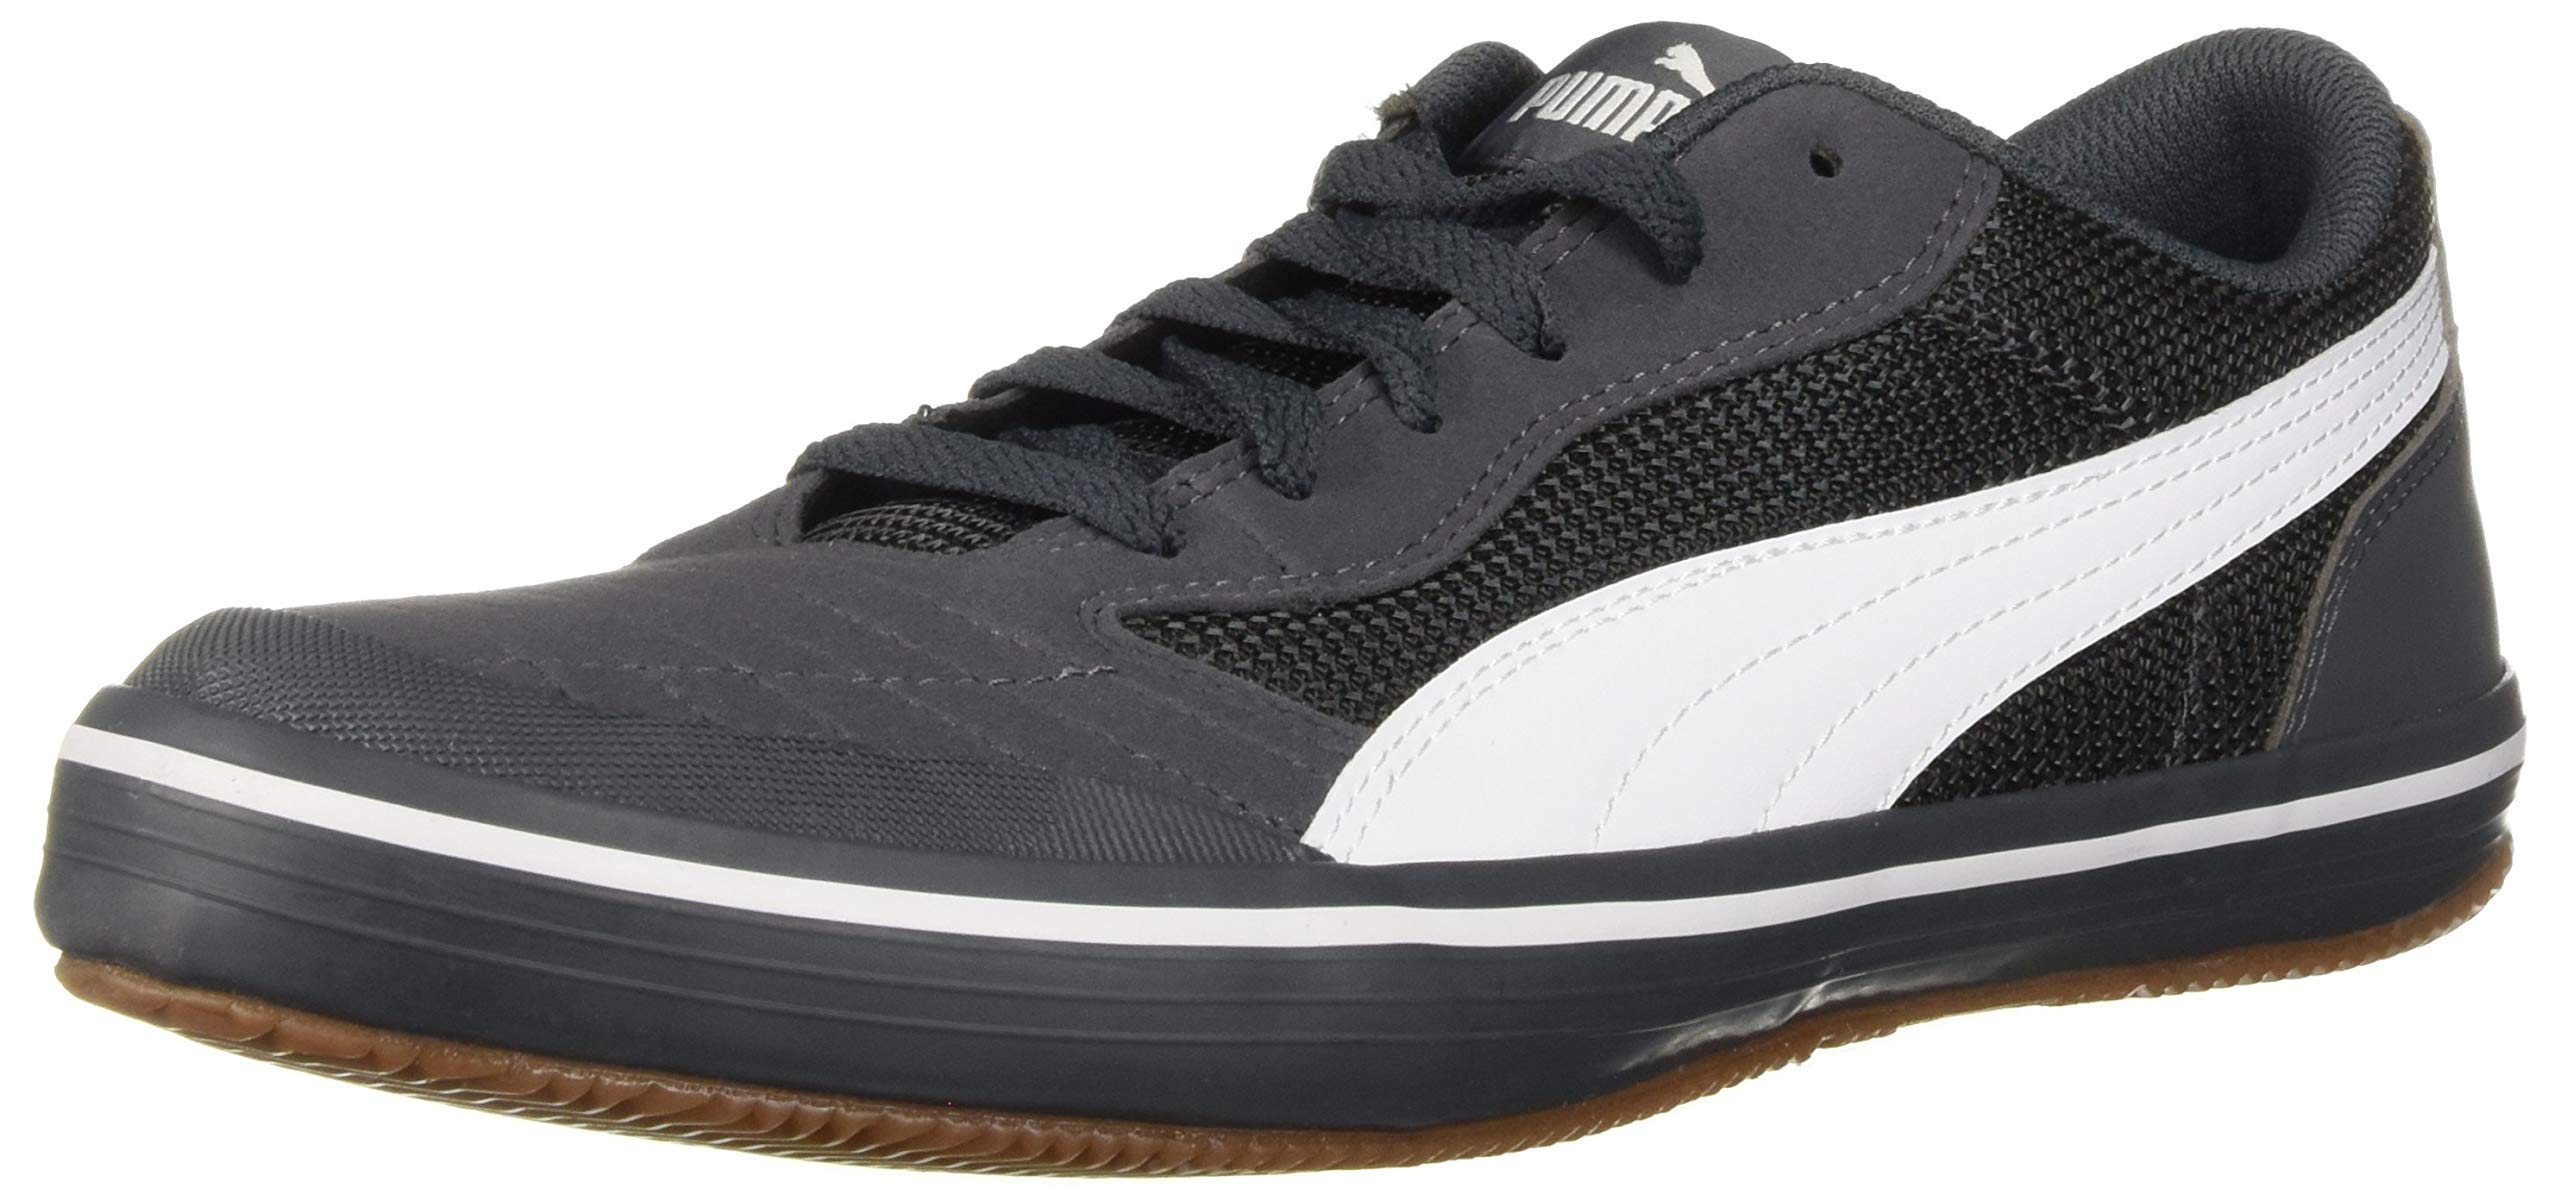 PUMA Men's Astro Sala Sneaker - Buy